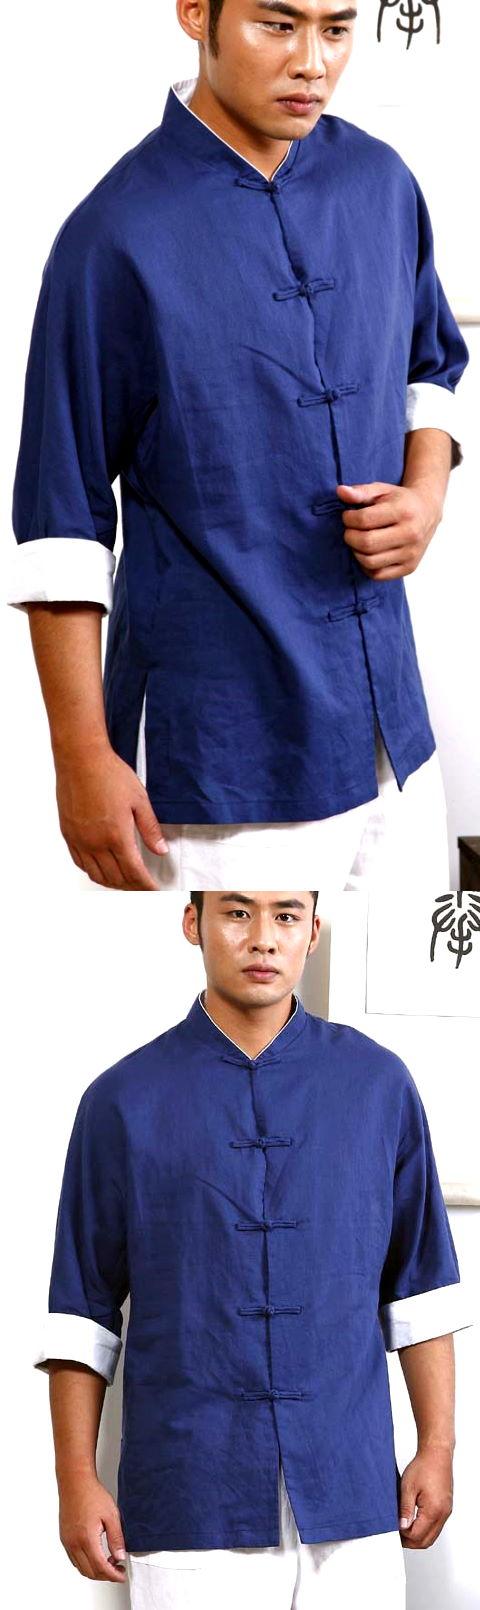 3/4-sleeve Mandarin Jacket/Shirt w/ Folding Cuffs (CM)